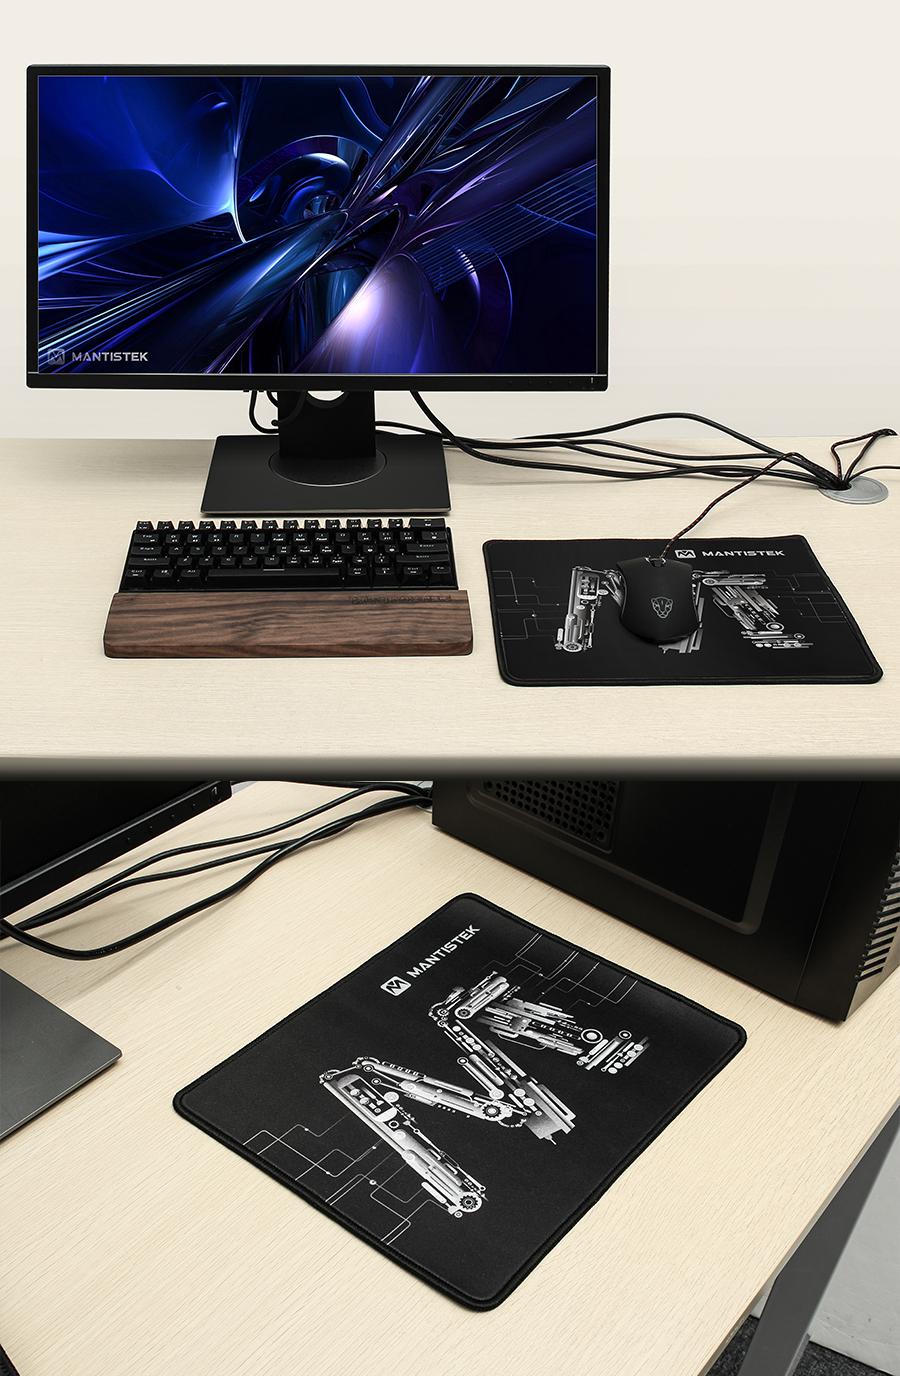 MantisTek® MP2 300*250*3mm Thick Non-Slip Overlock Gaming Mouse Pad Mat